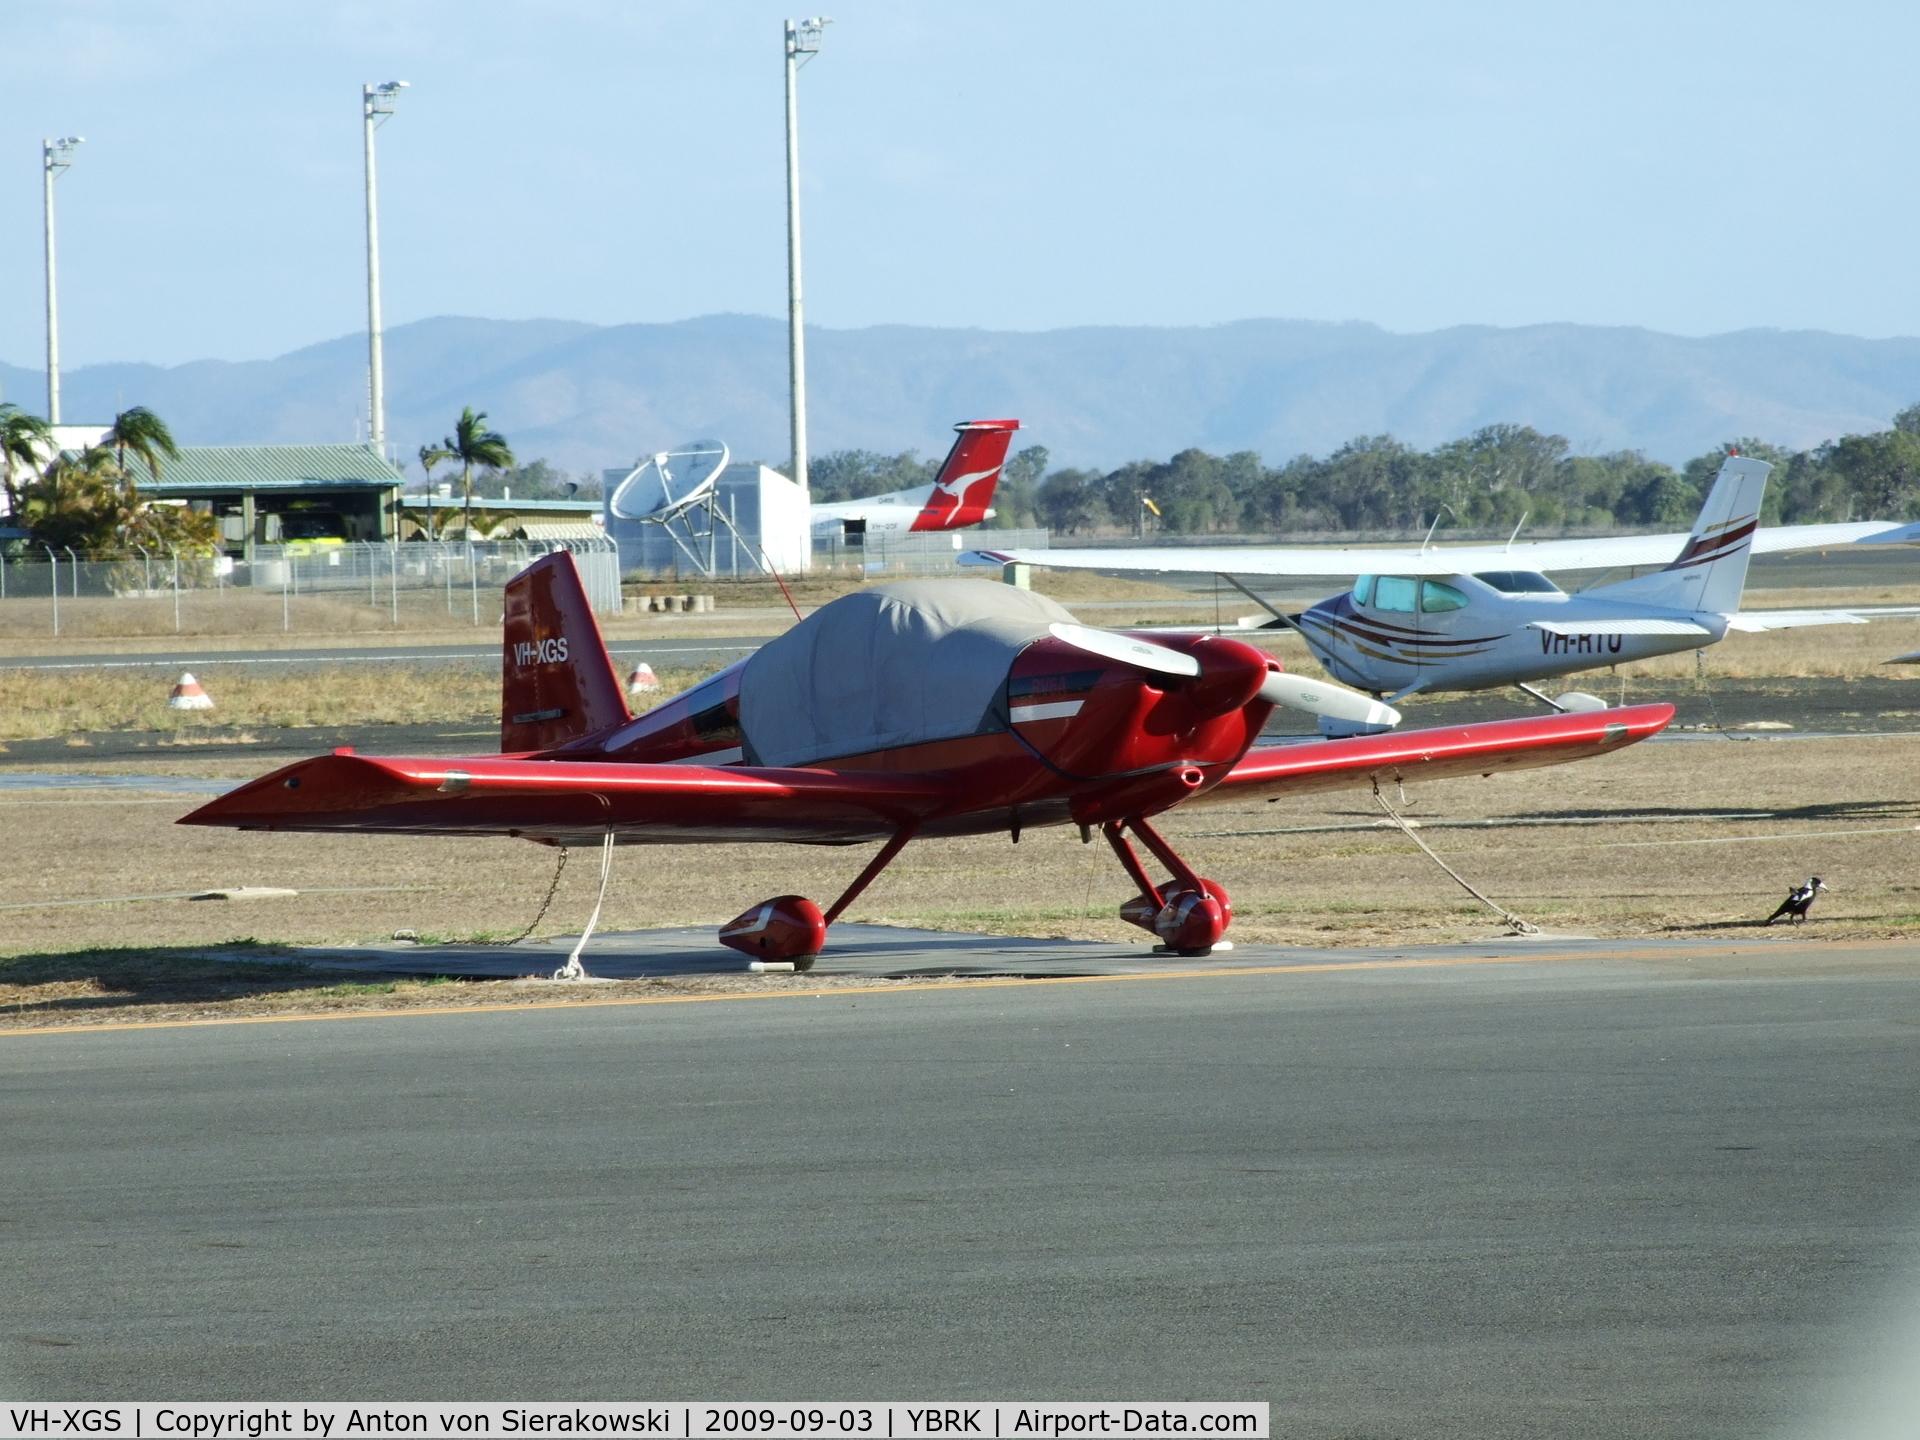 532750 Dozens of Experimental Amateur Built aircraft designs fit the LSA mold ...